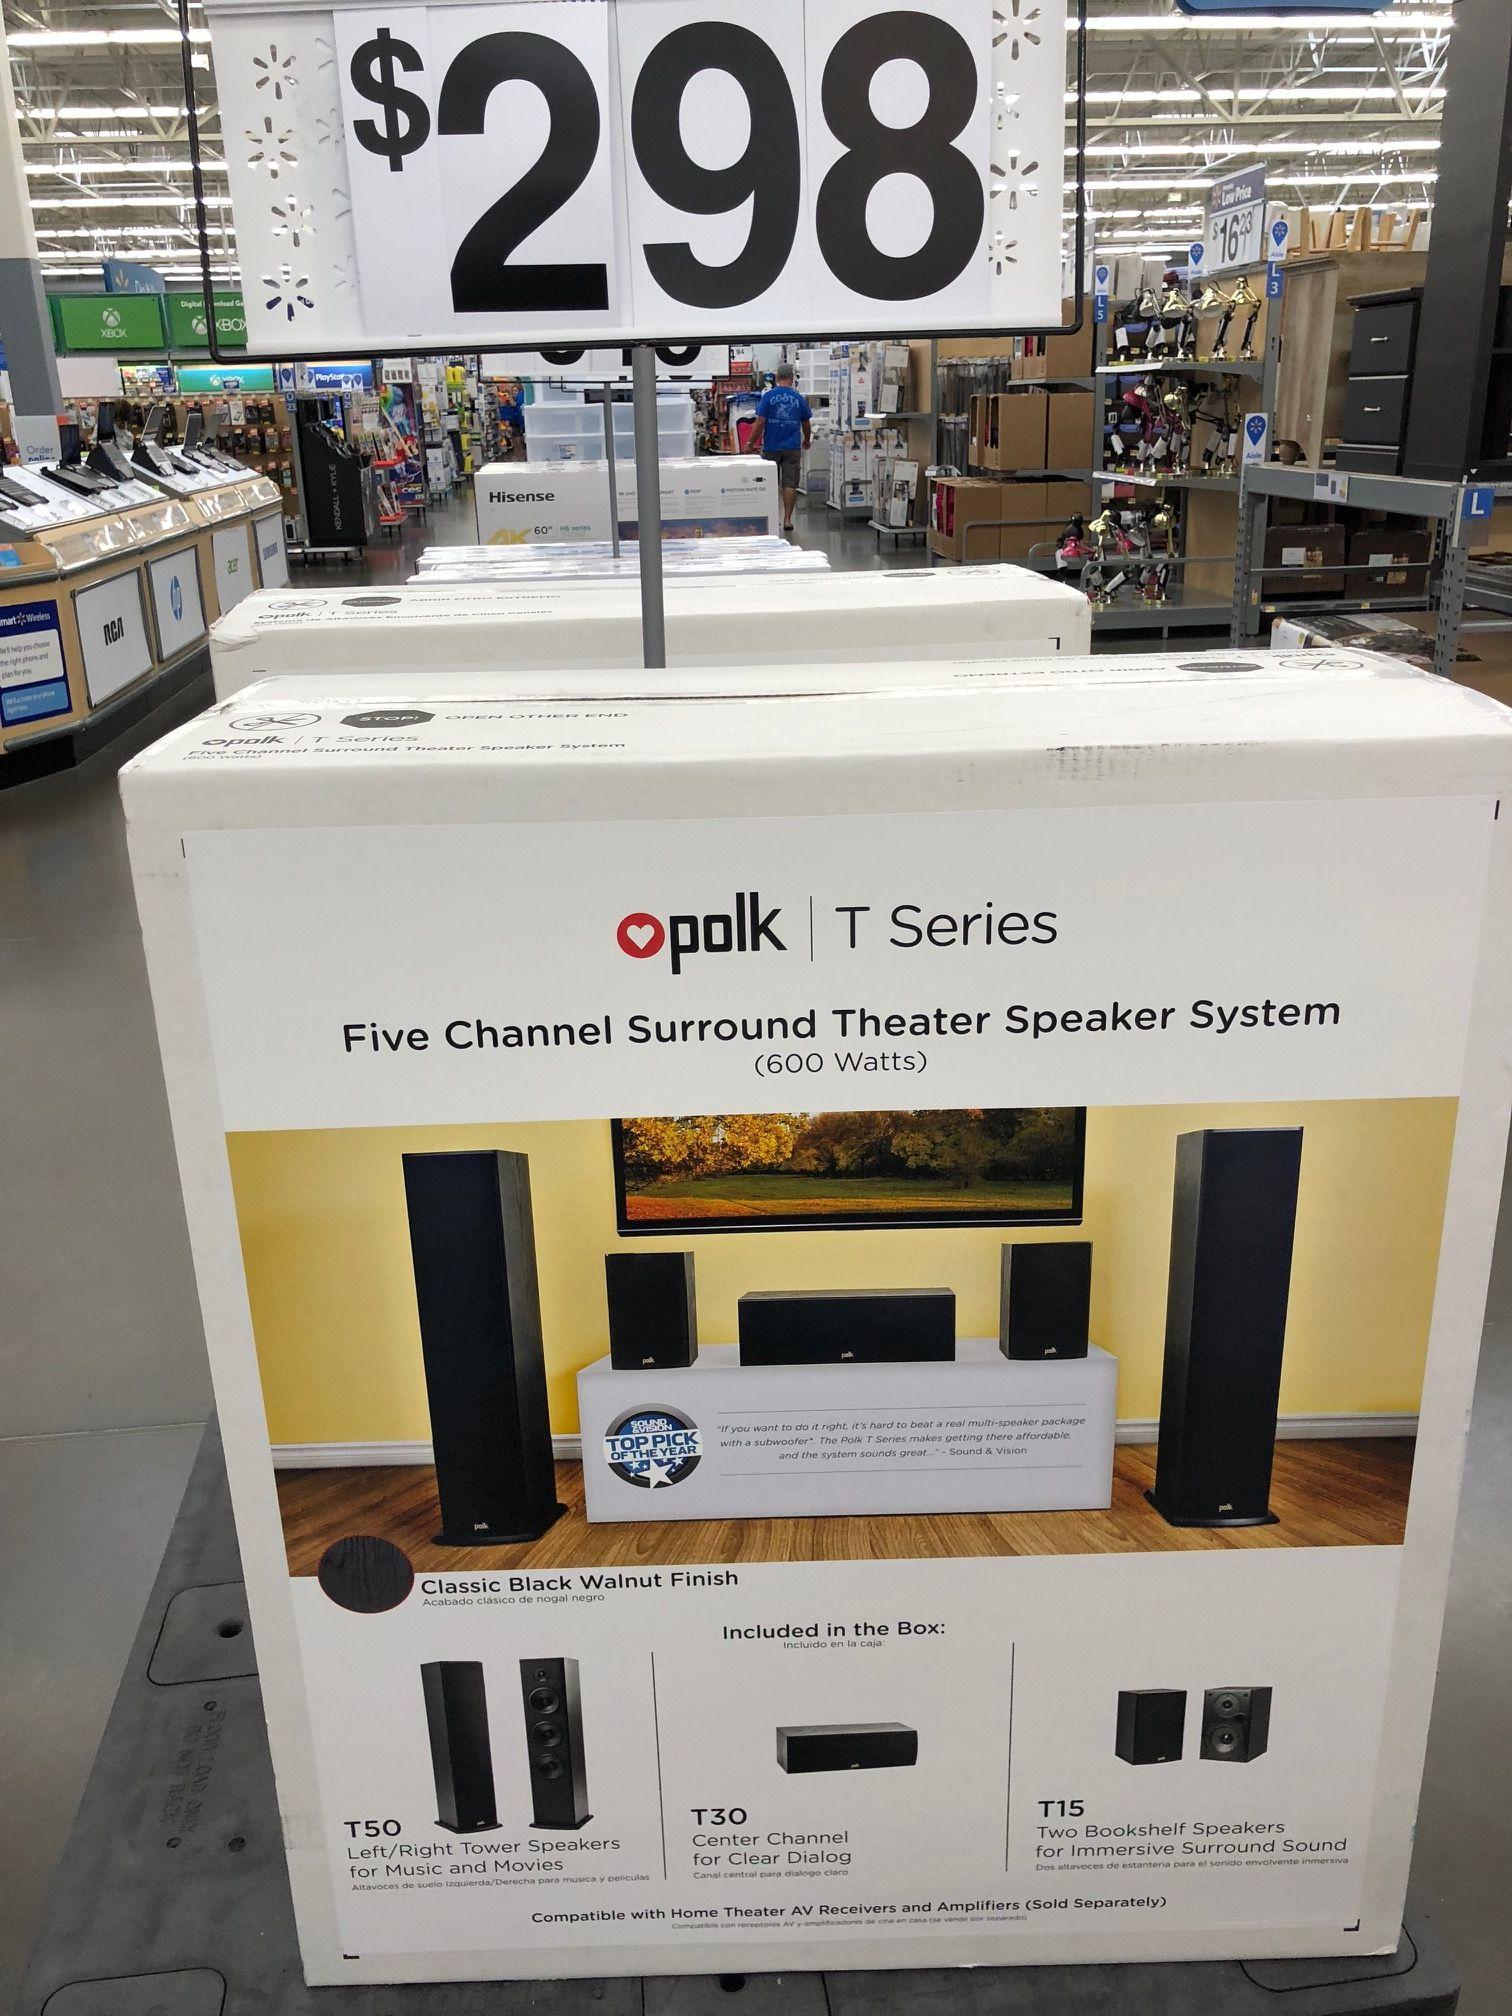 Polk Five Channel Surround Theater Speakers System (2 Floor, 1 Center, 2 Bookshelf) $298